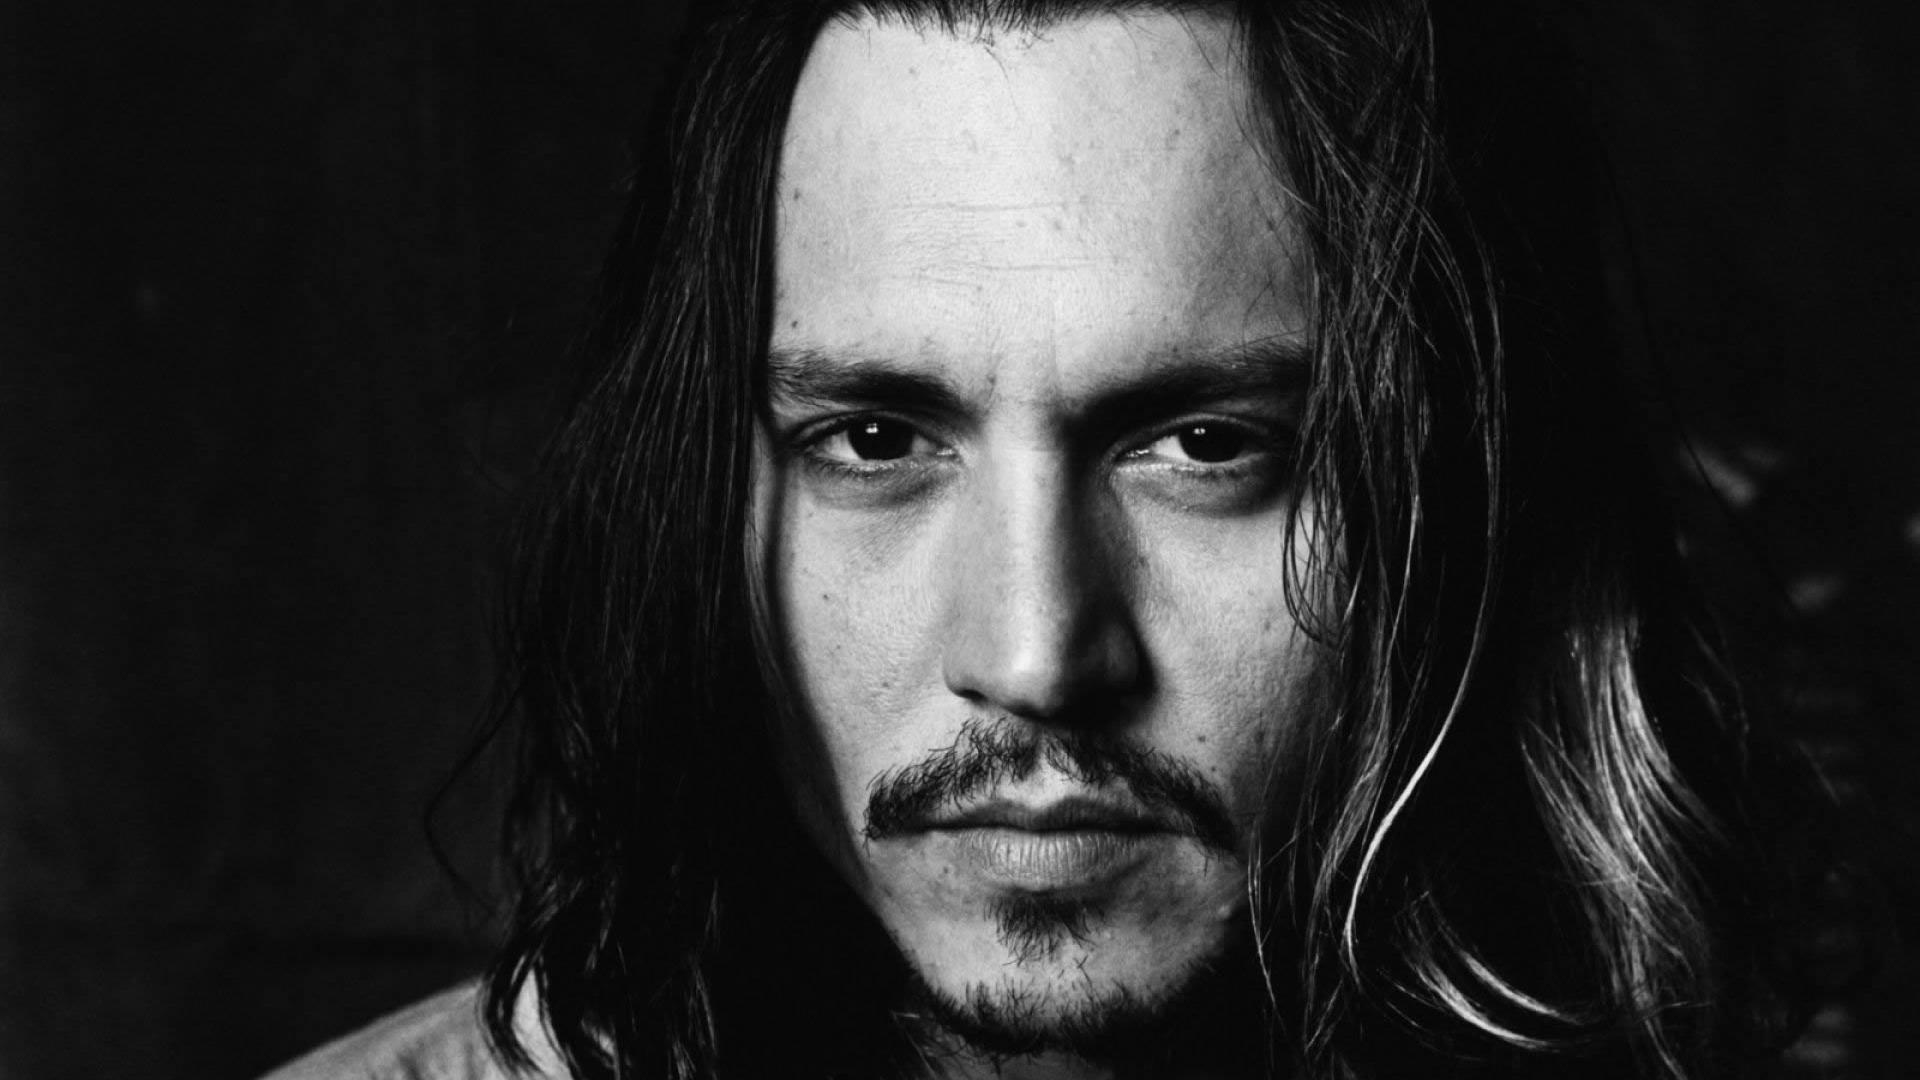 HD Johnny Depp Wallpapers 1 HdCoolWallpapersCom 1920x1080